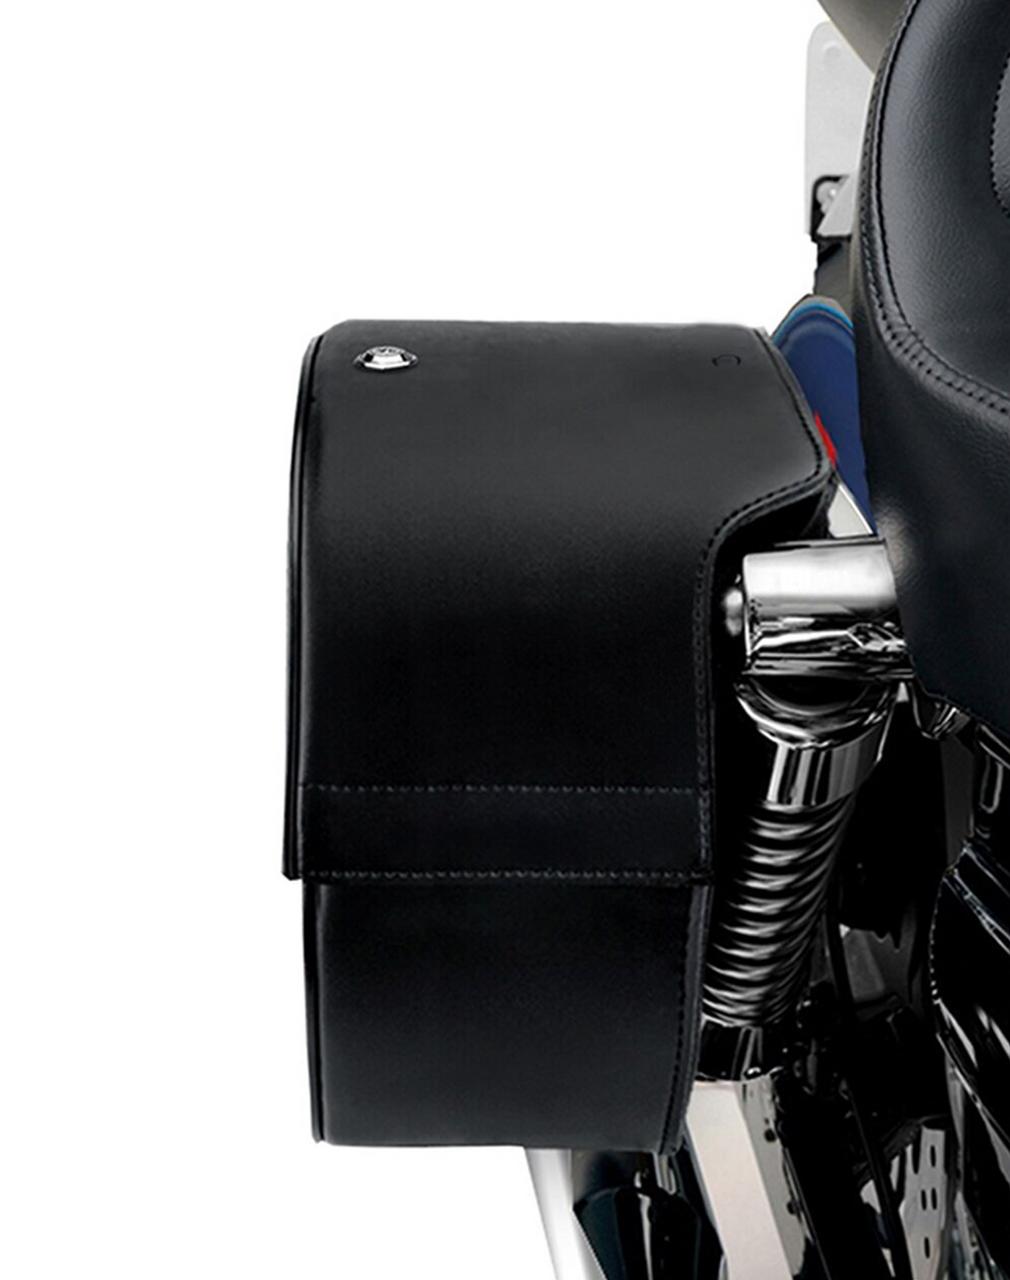 VikingBags Sabre Medium Single Strap Shock Cutout Honda Rebel 500 ABS CMX500A Leather Motorcycle Saddlebags Shock Cutout View